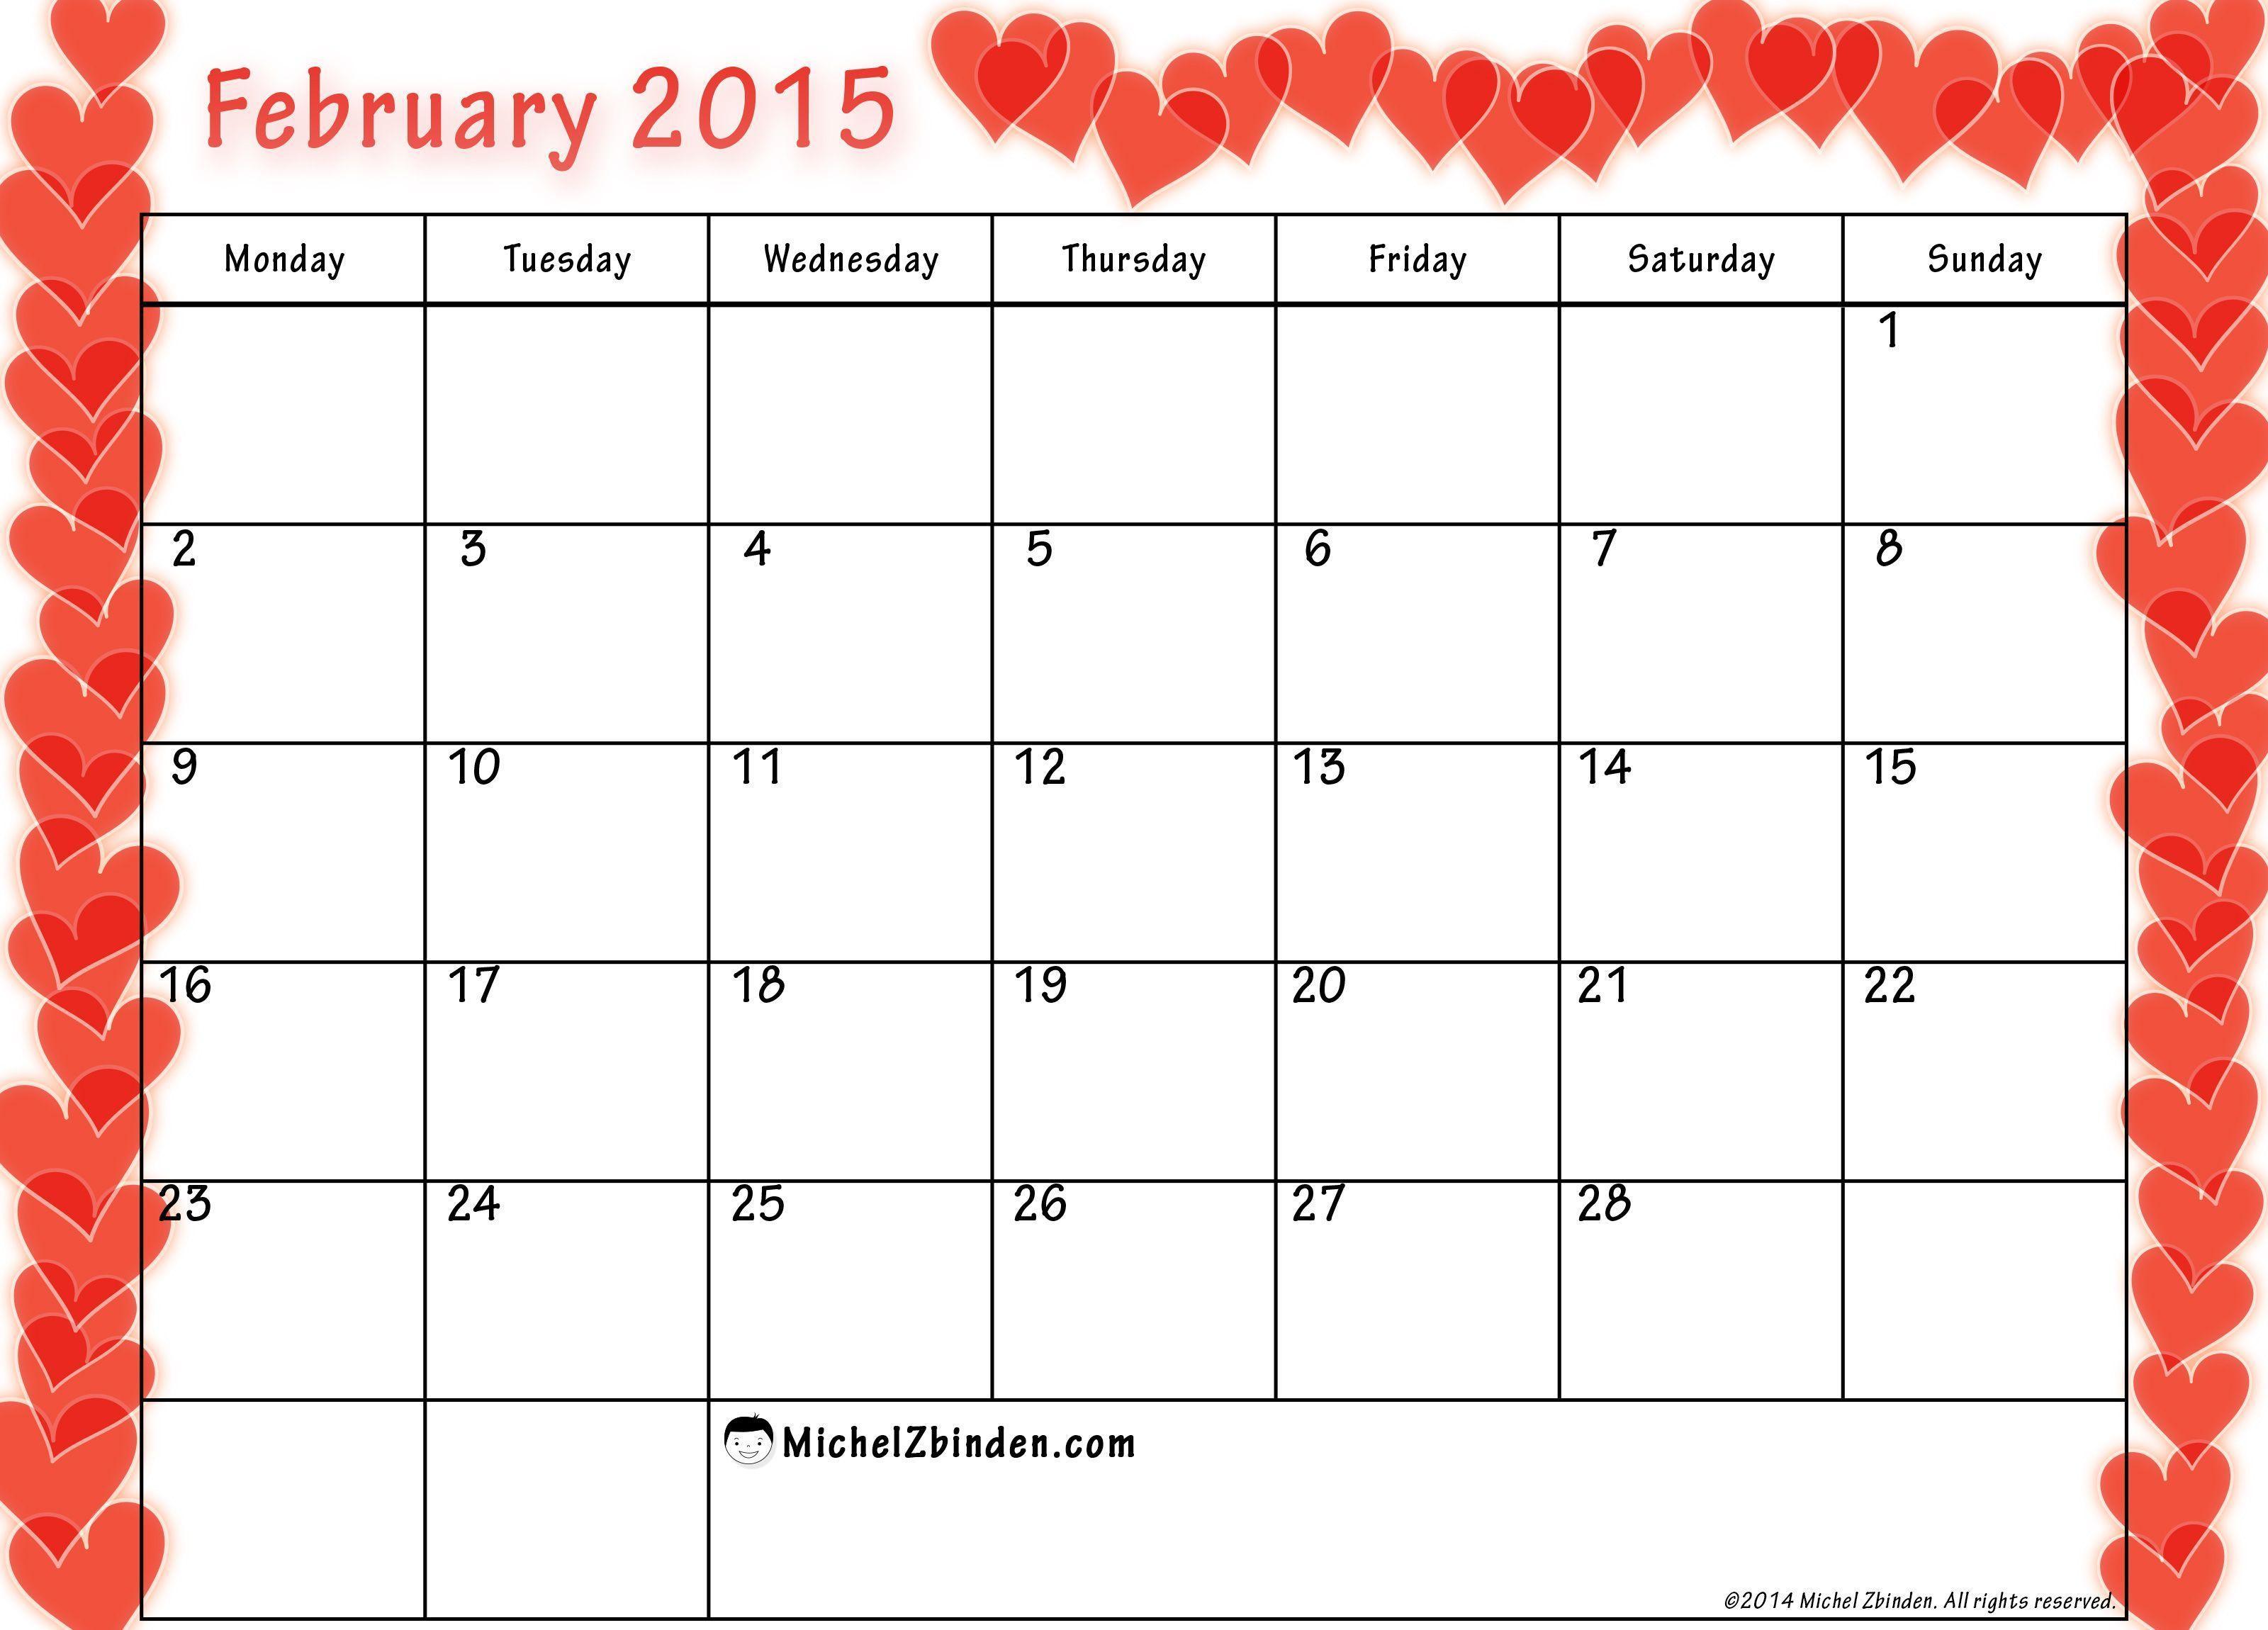 Calendar Wallpaper Creator : February wallpapers calendar wallpaper cave